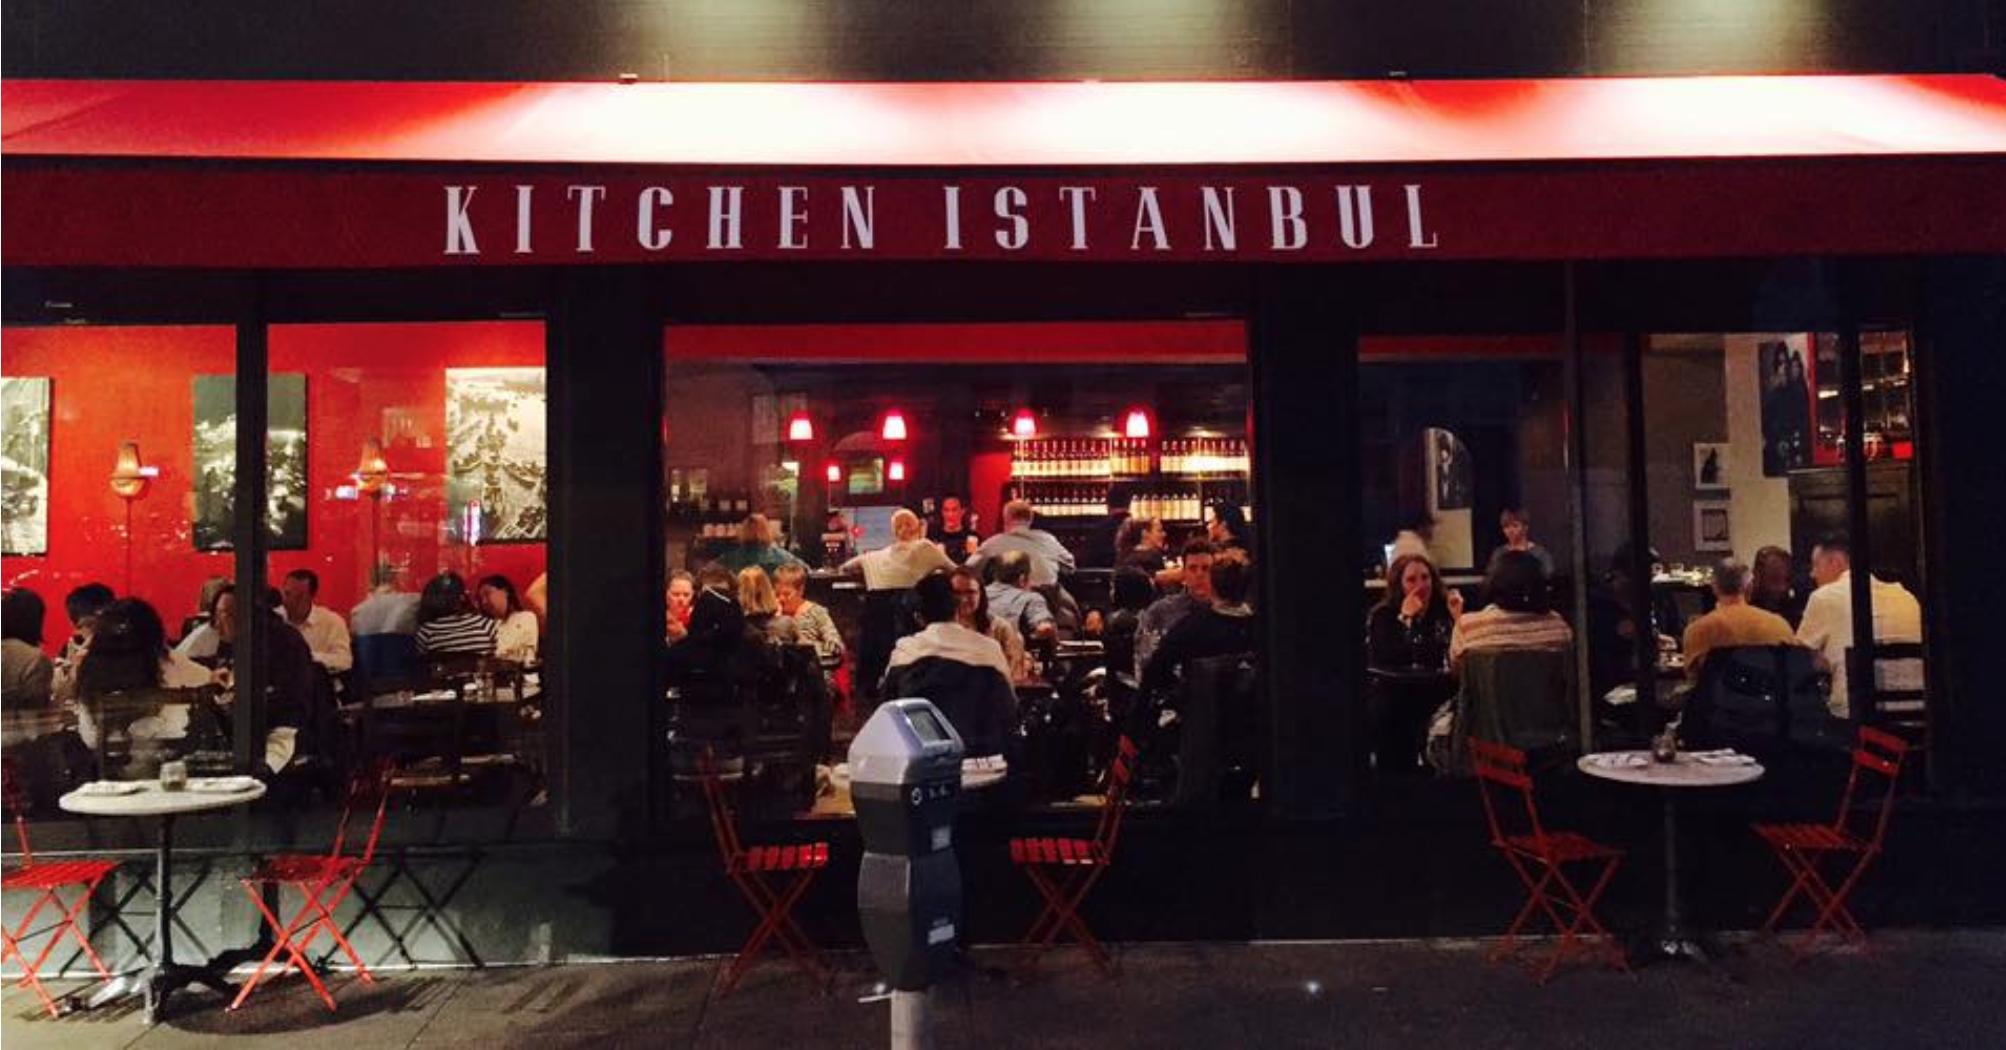 Kitchen Istanbul